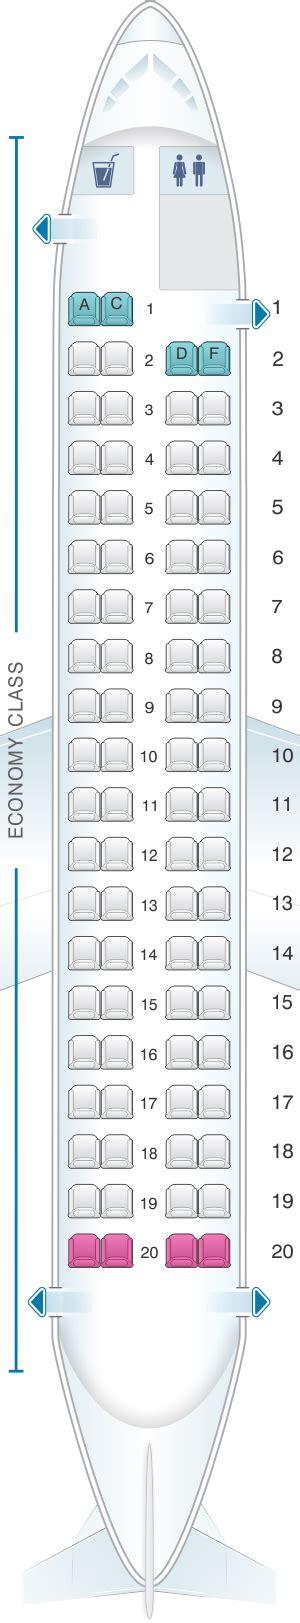 dash 8 400 seating seat map spicejet bombardier q400 seatmaestro